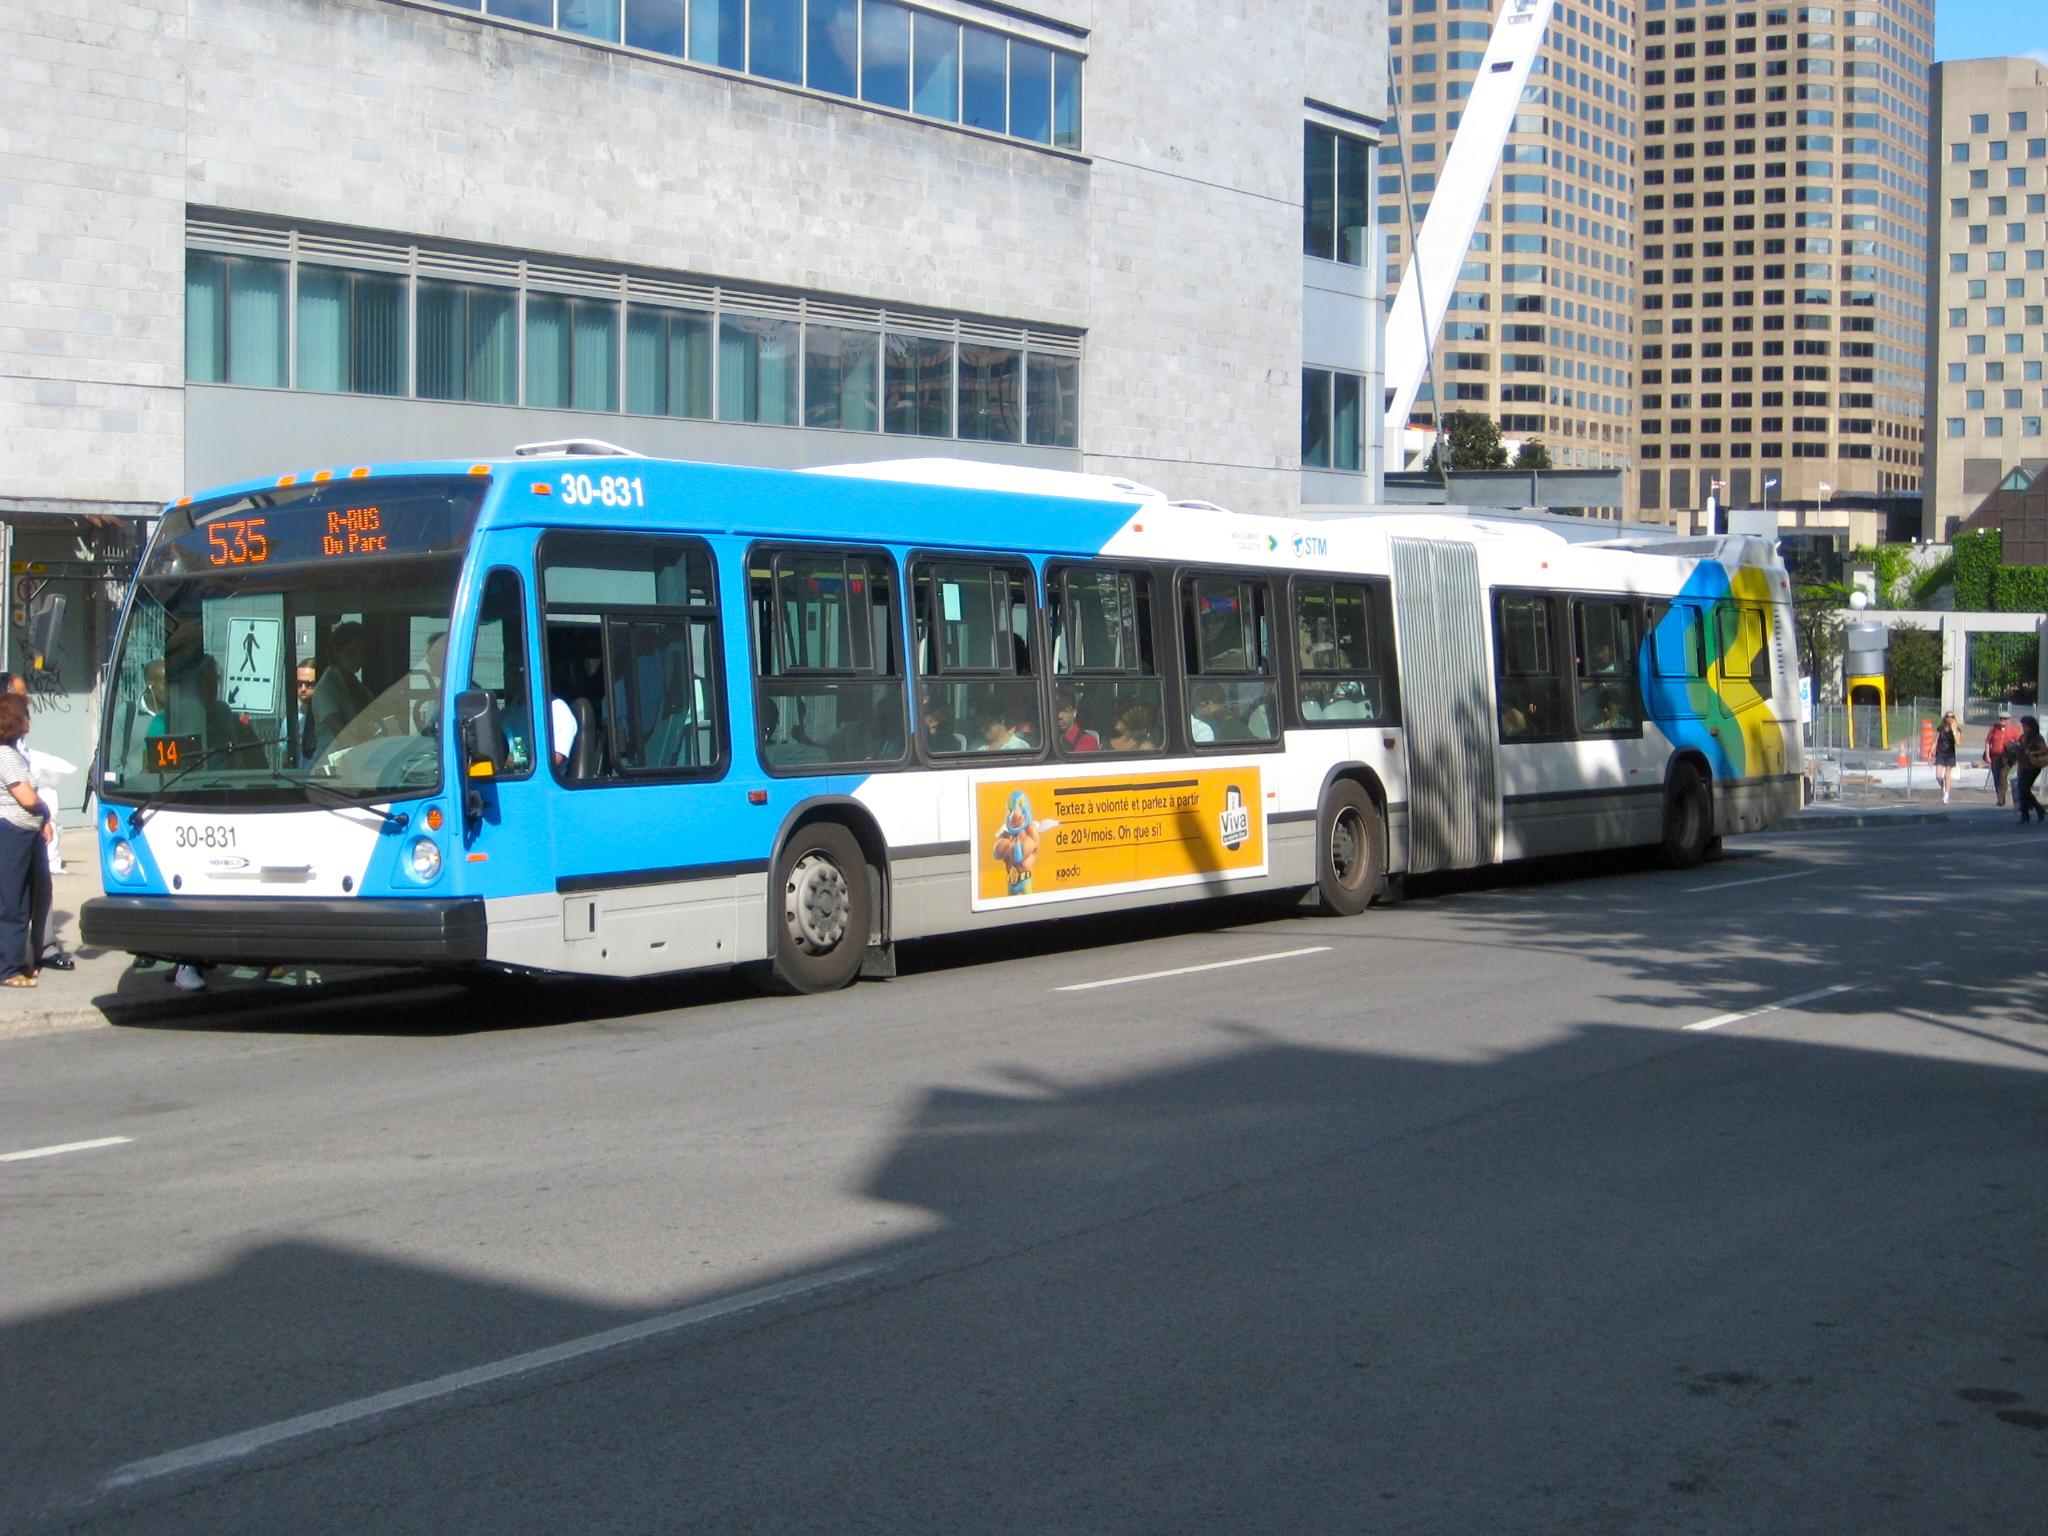 435 reserved lane parc/côte-des-neiges - wikipedia